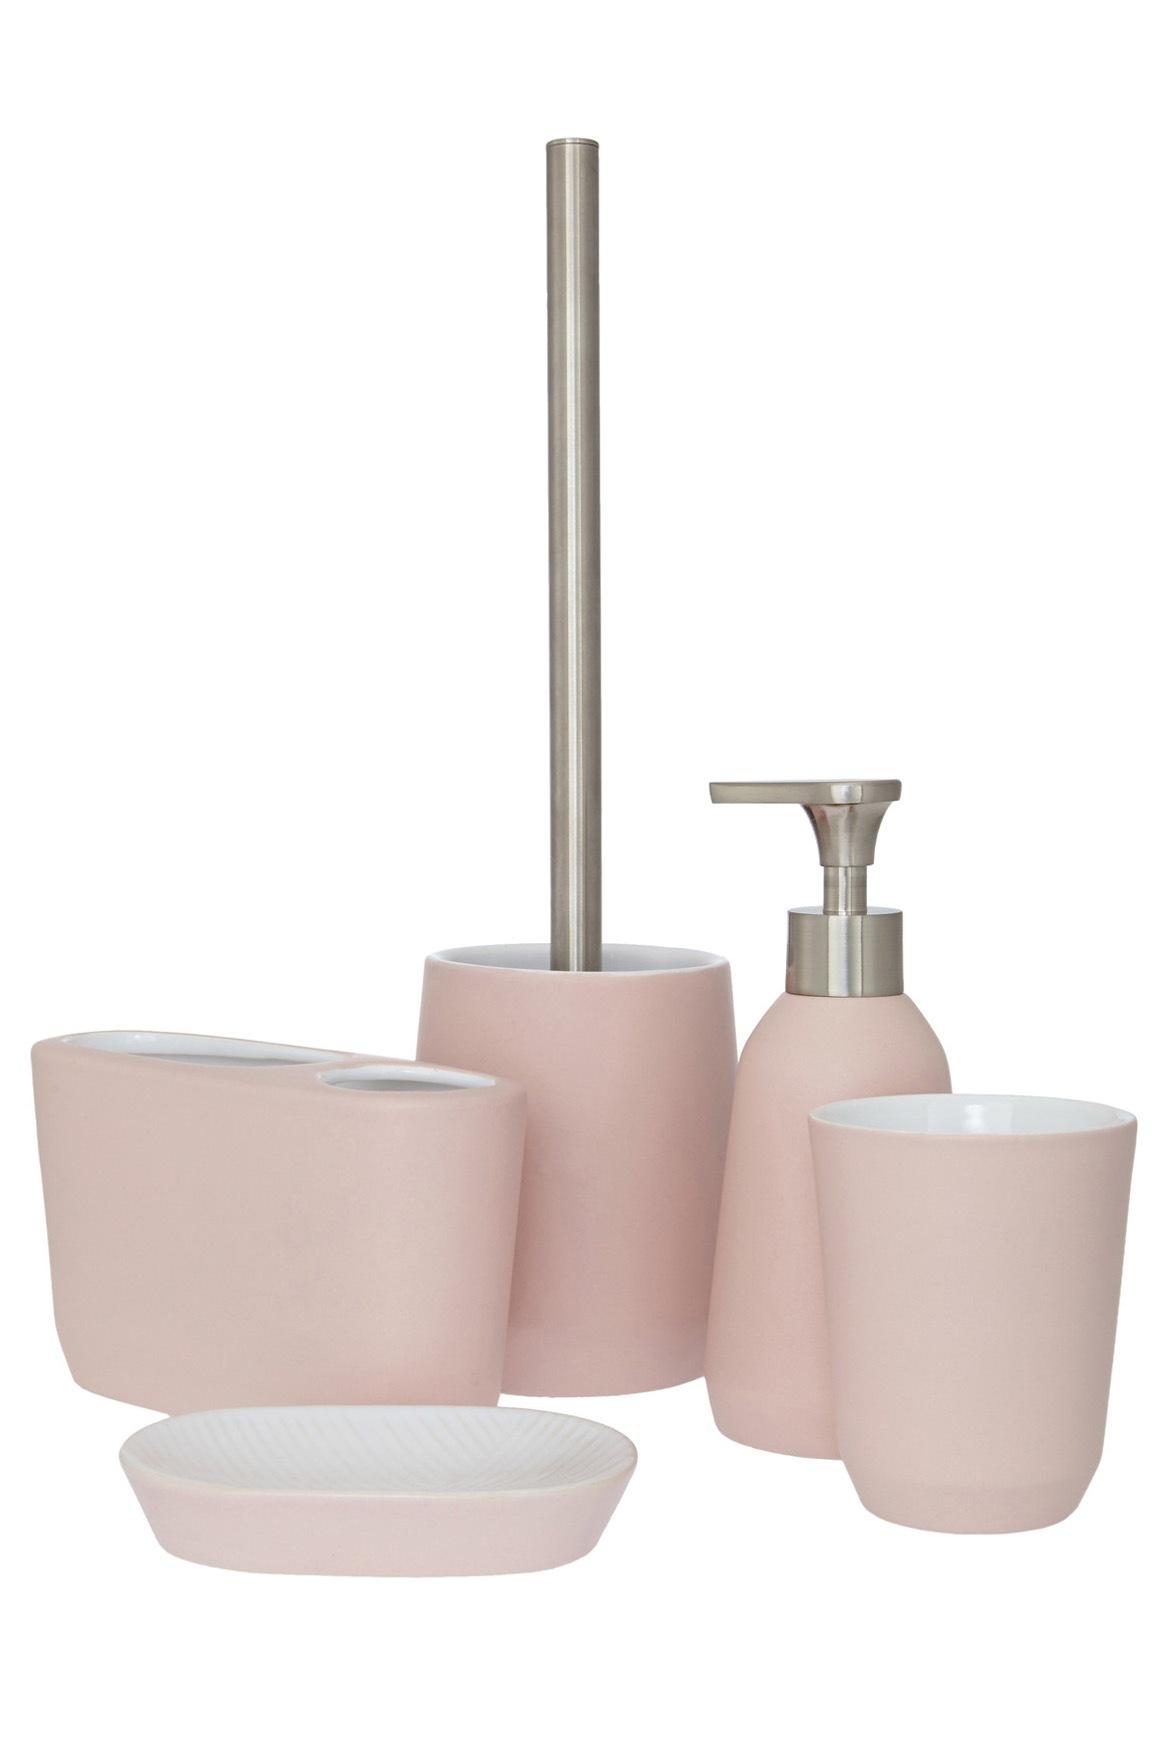 Myer bathroom accessories - John Lewis Lunda Plaster Ceramic Bathroom Accessories In Pink Myer Online